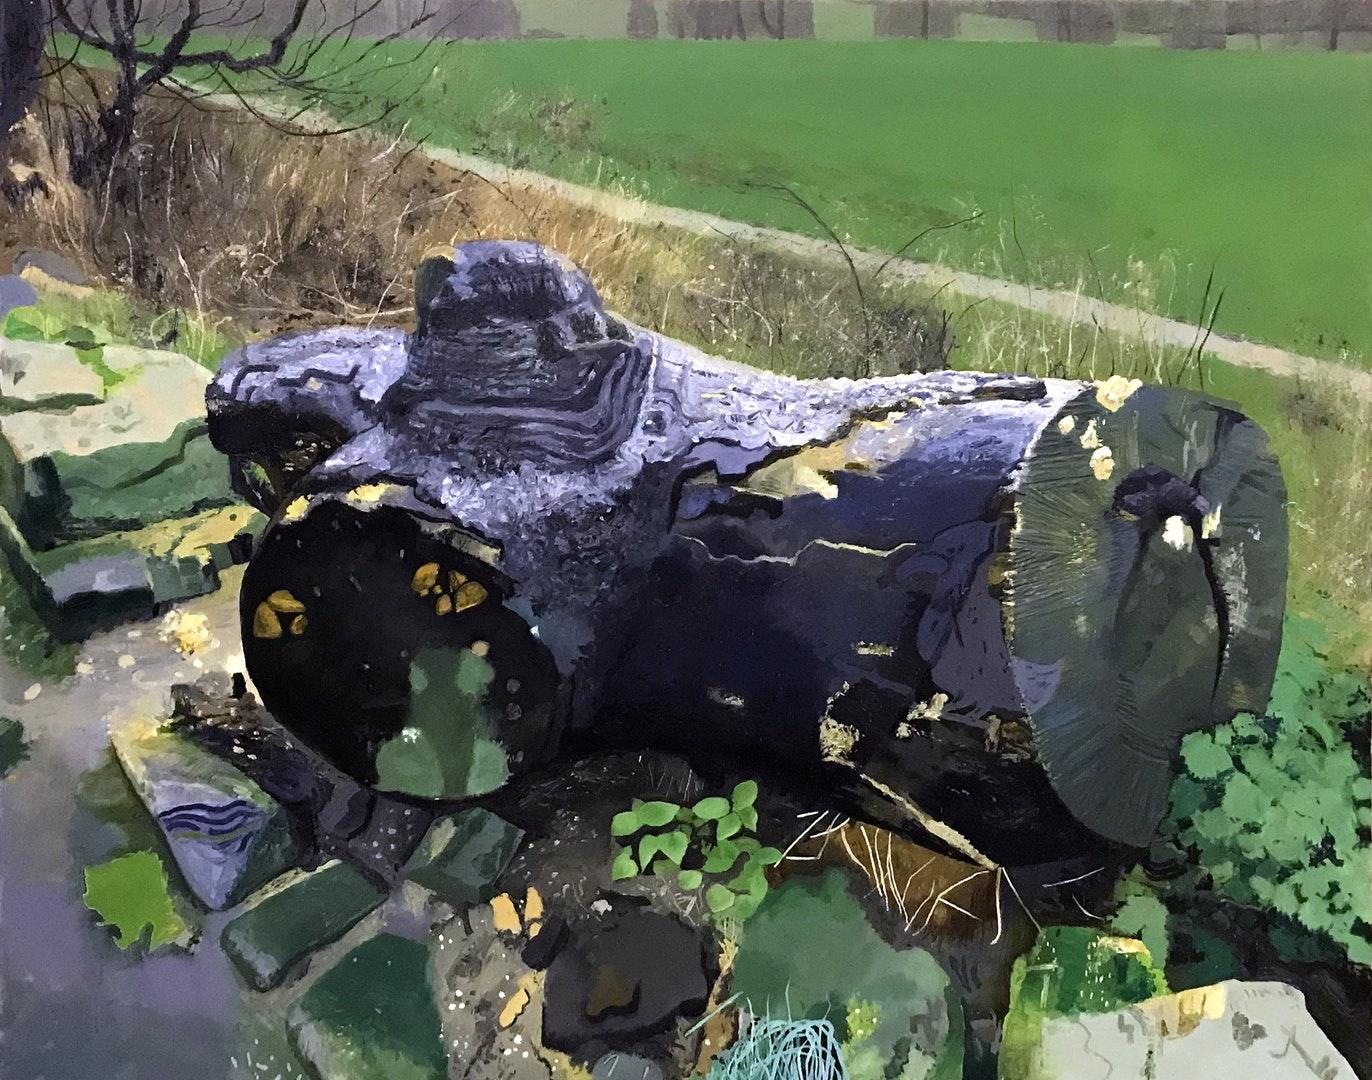 Iain Nicholls  Bad Bird On A Black Log  Oil on canvas, 122 x 152 x 3 cm  http://www.iain-nicholls.com